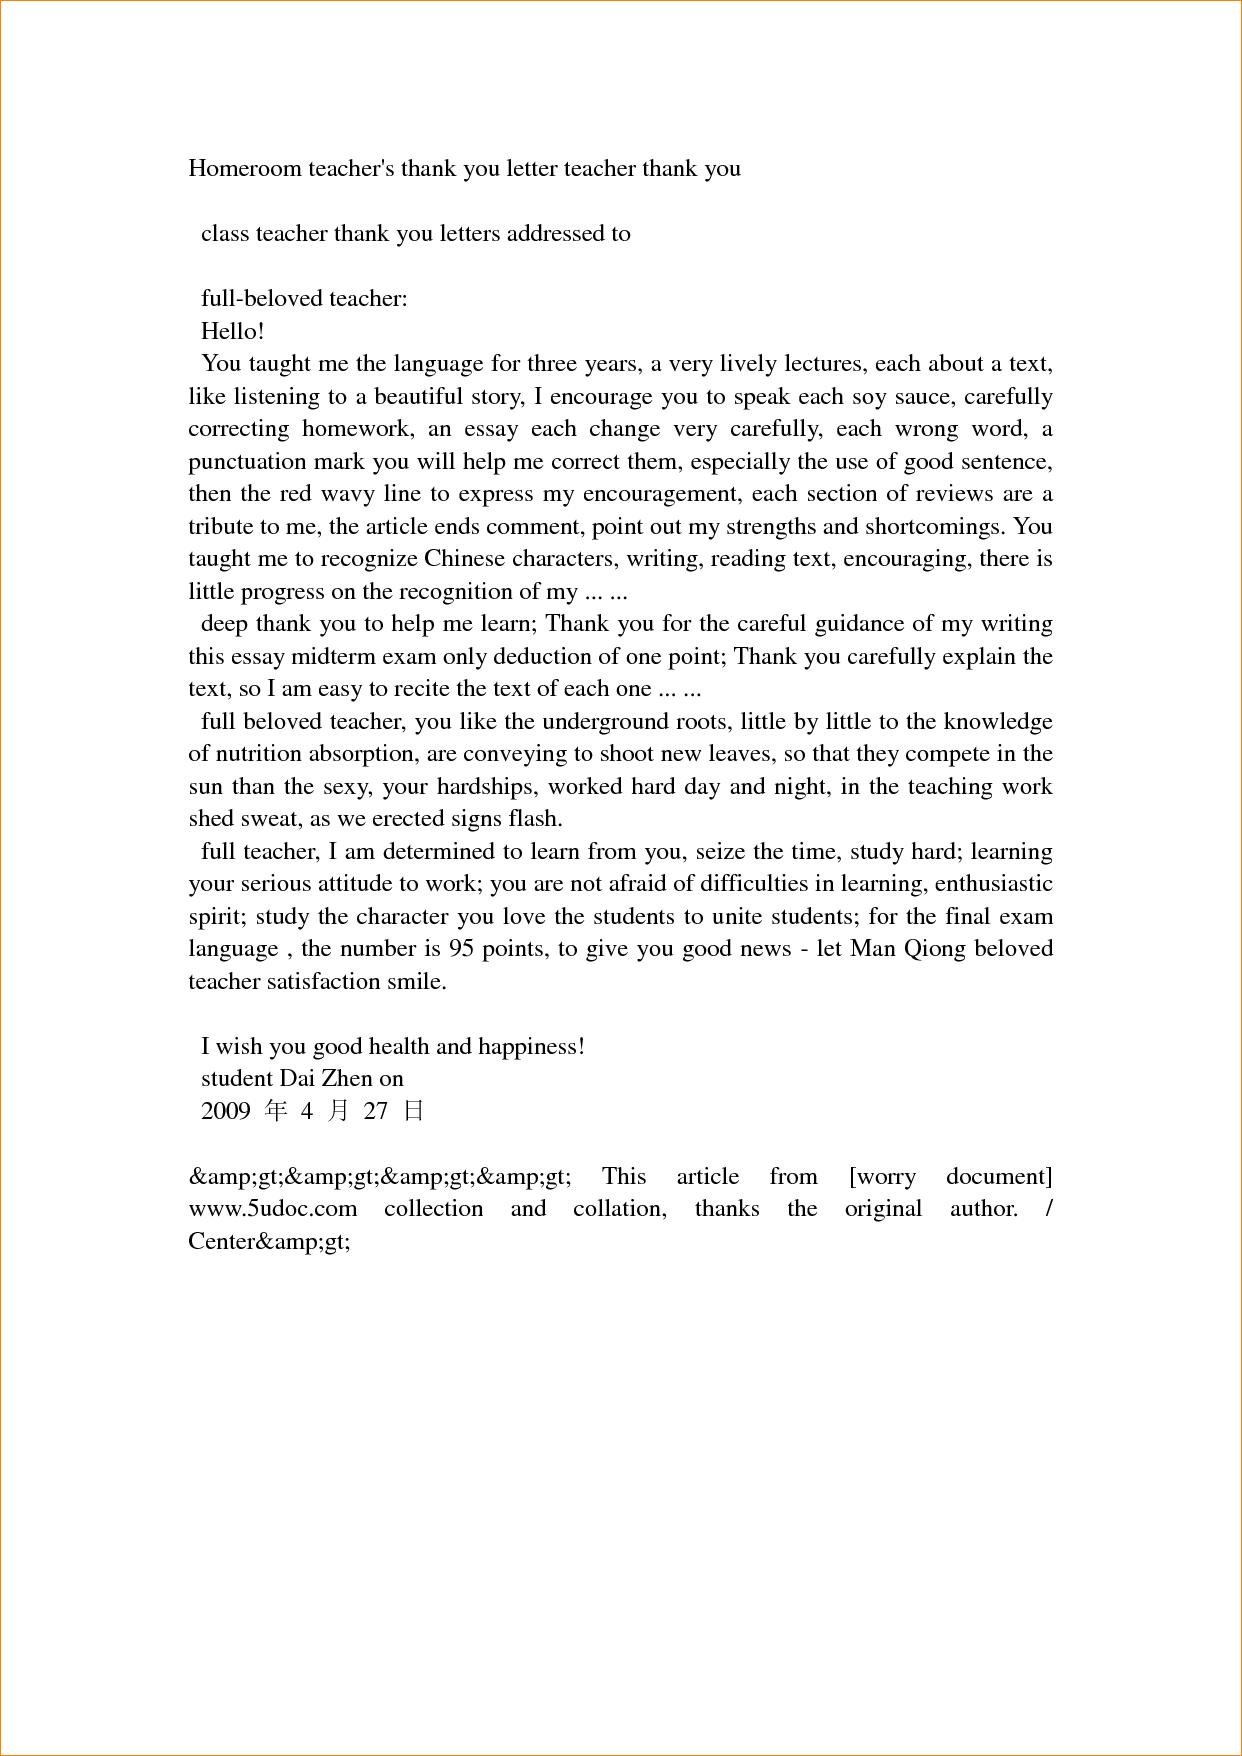 parents sample mersnproforum teacher appreciation letter from